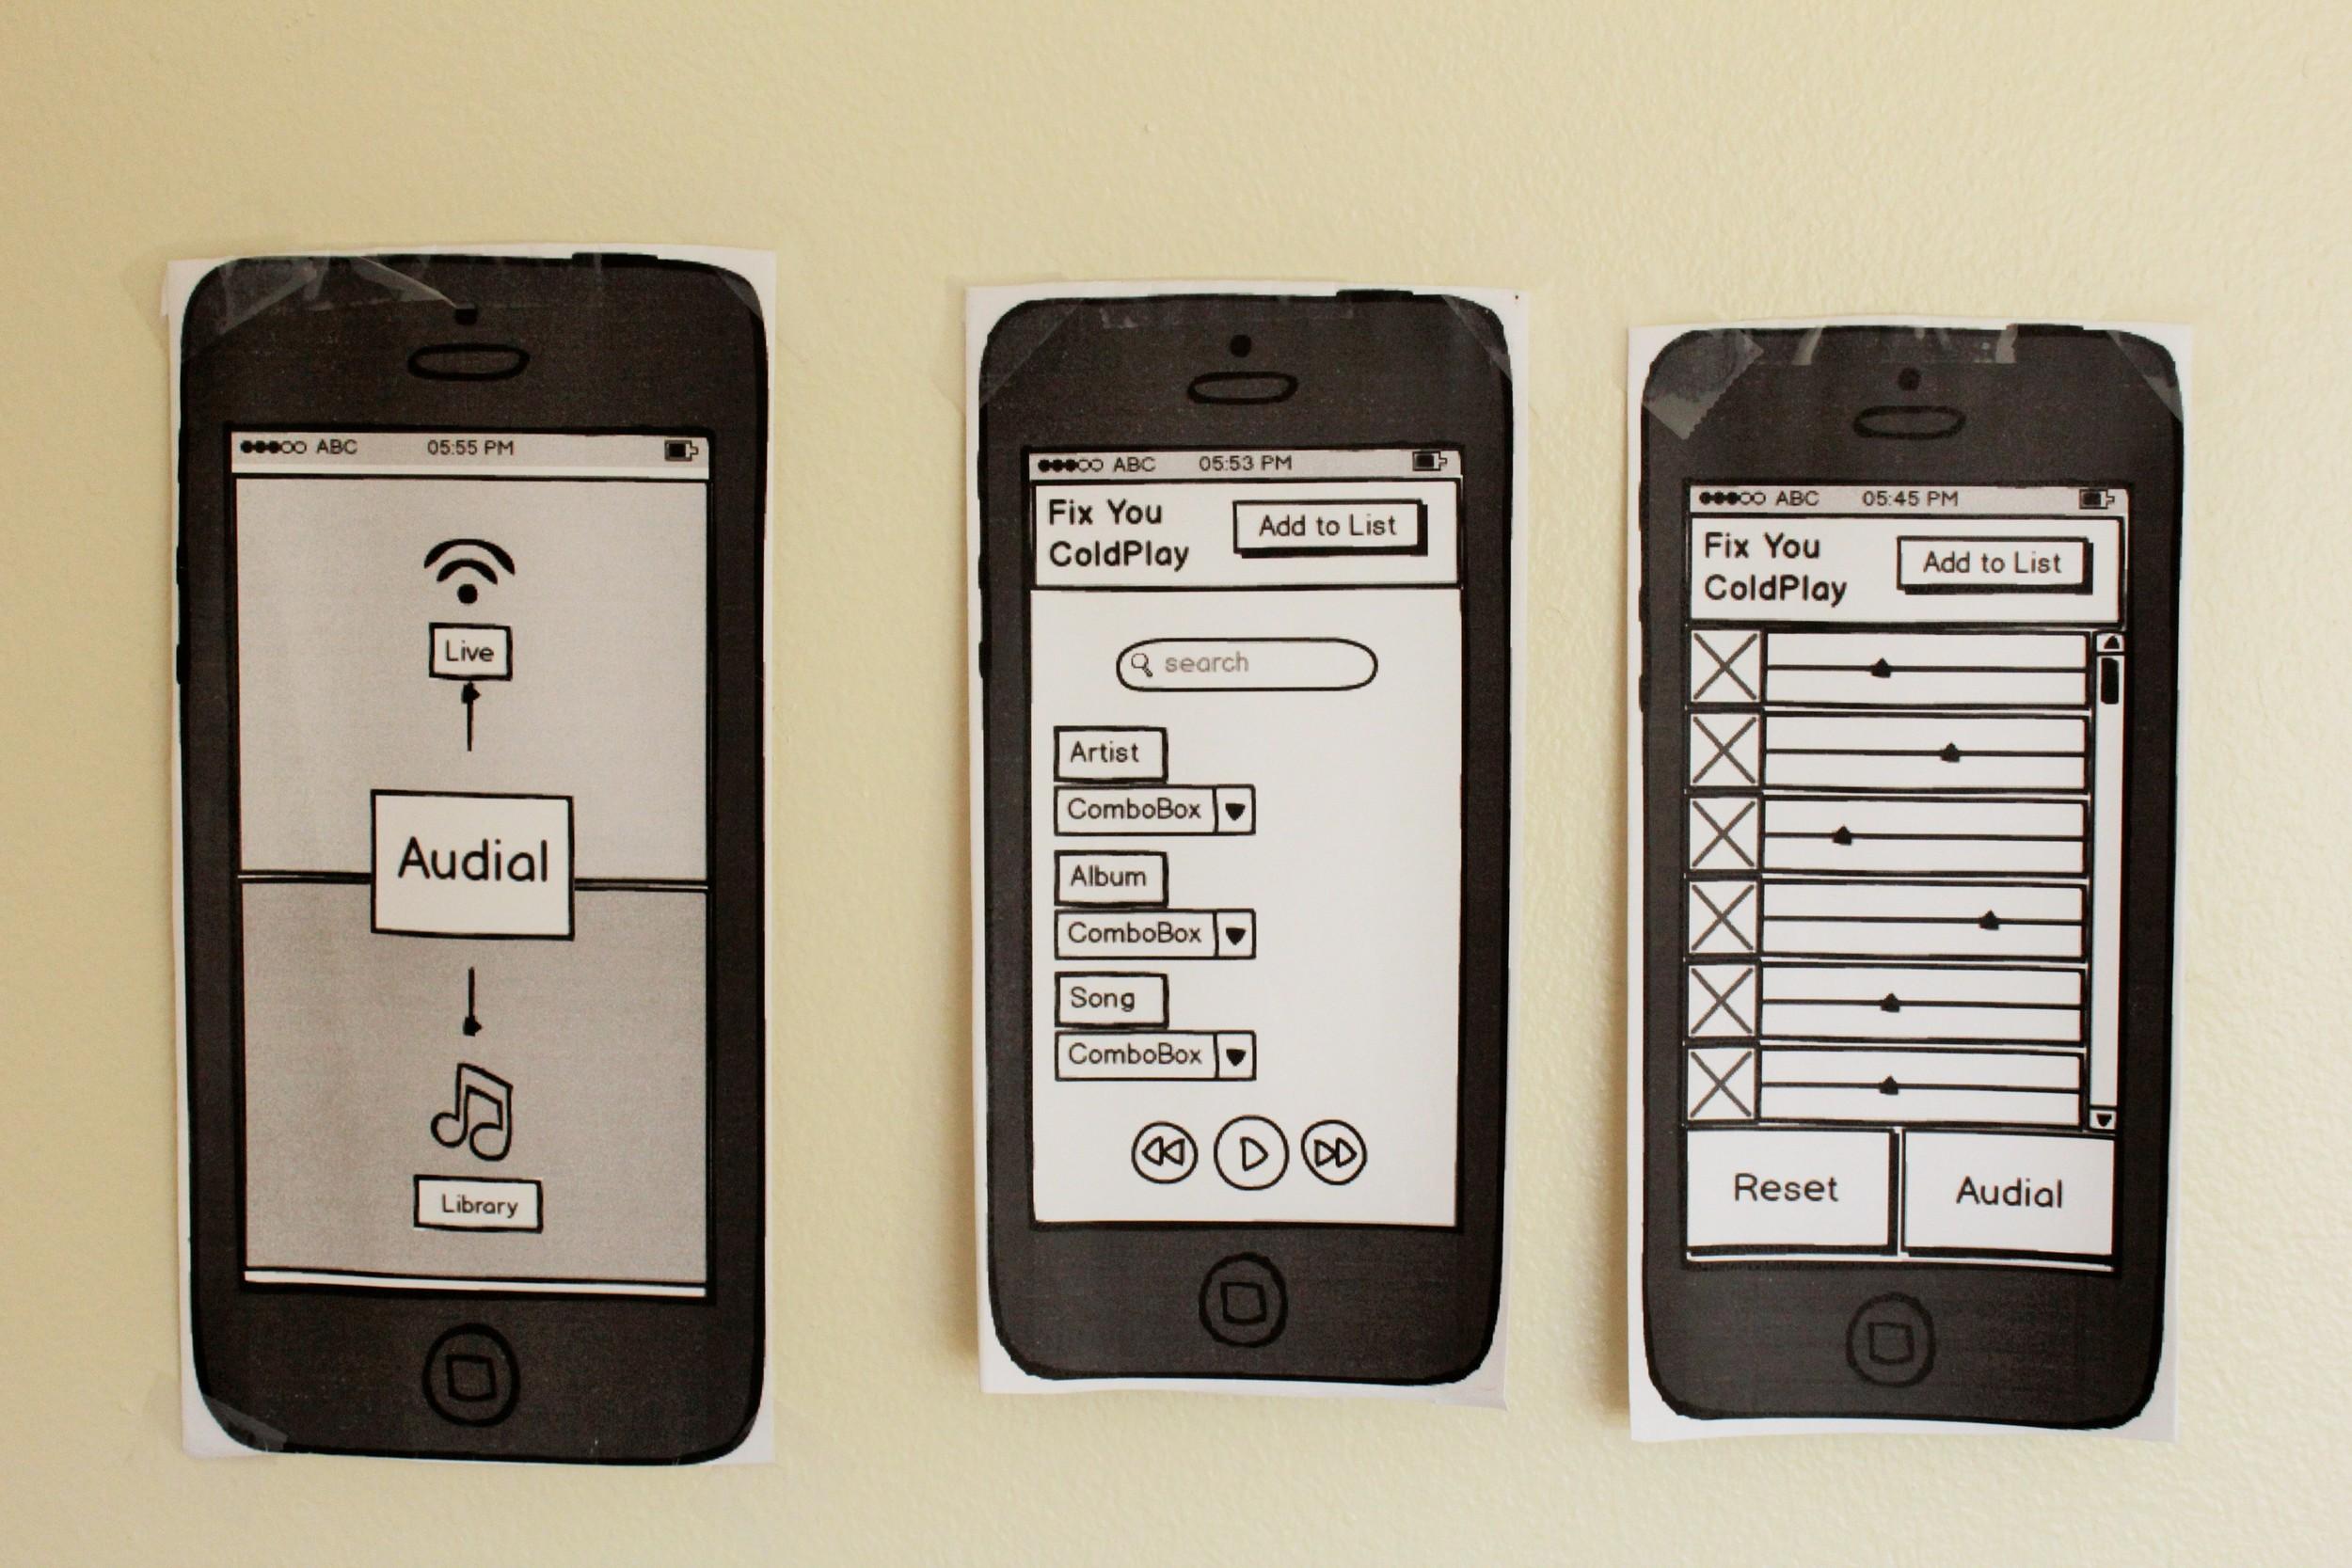 Audial - Balsamiq, Prototype printouts